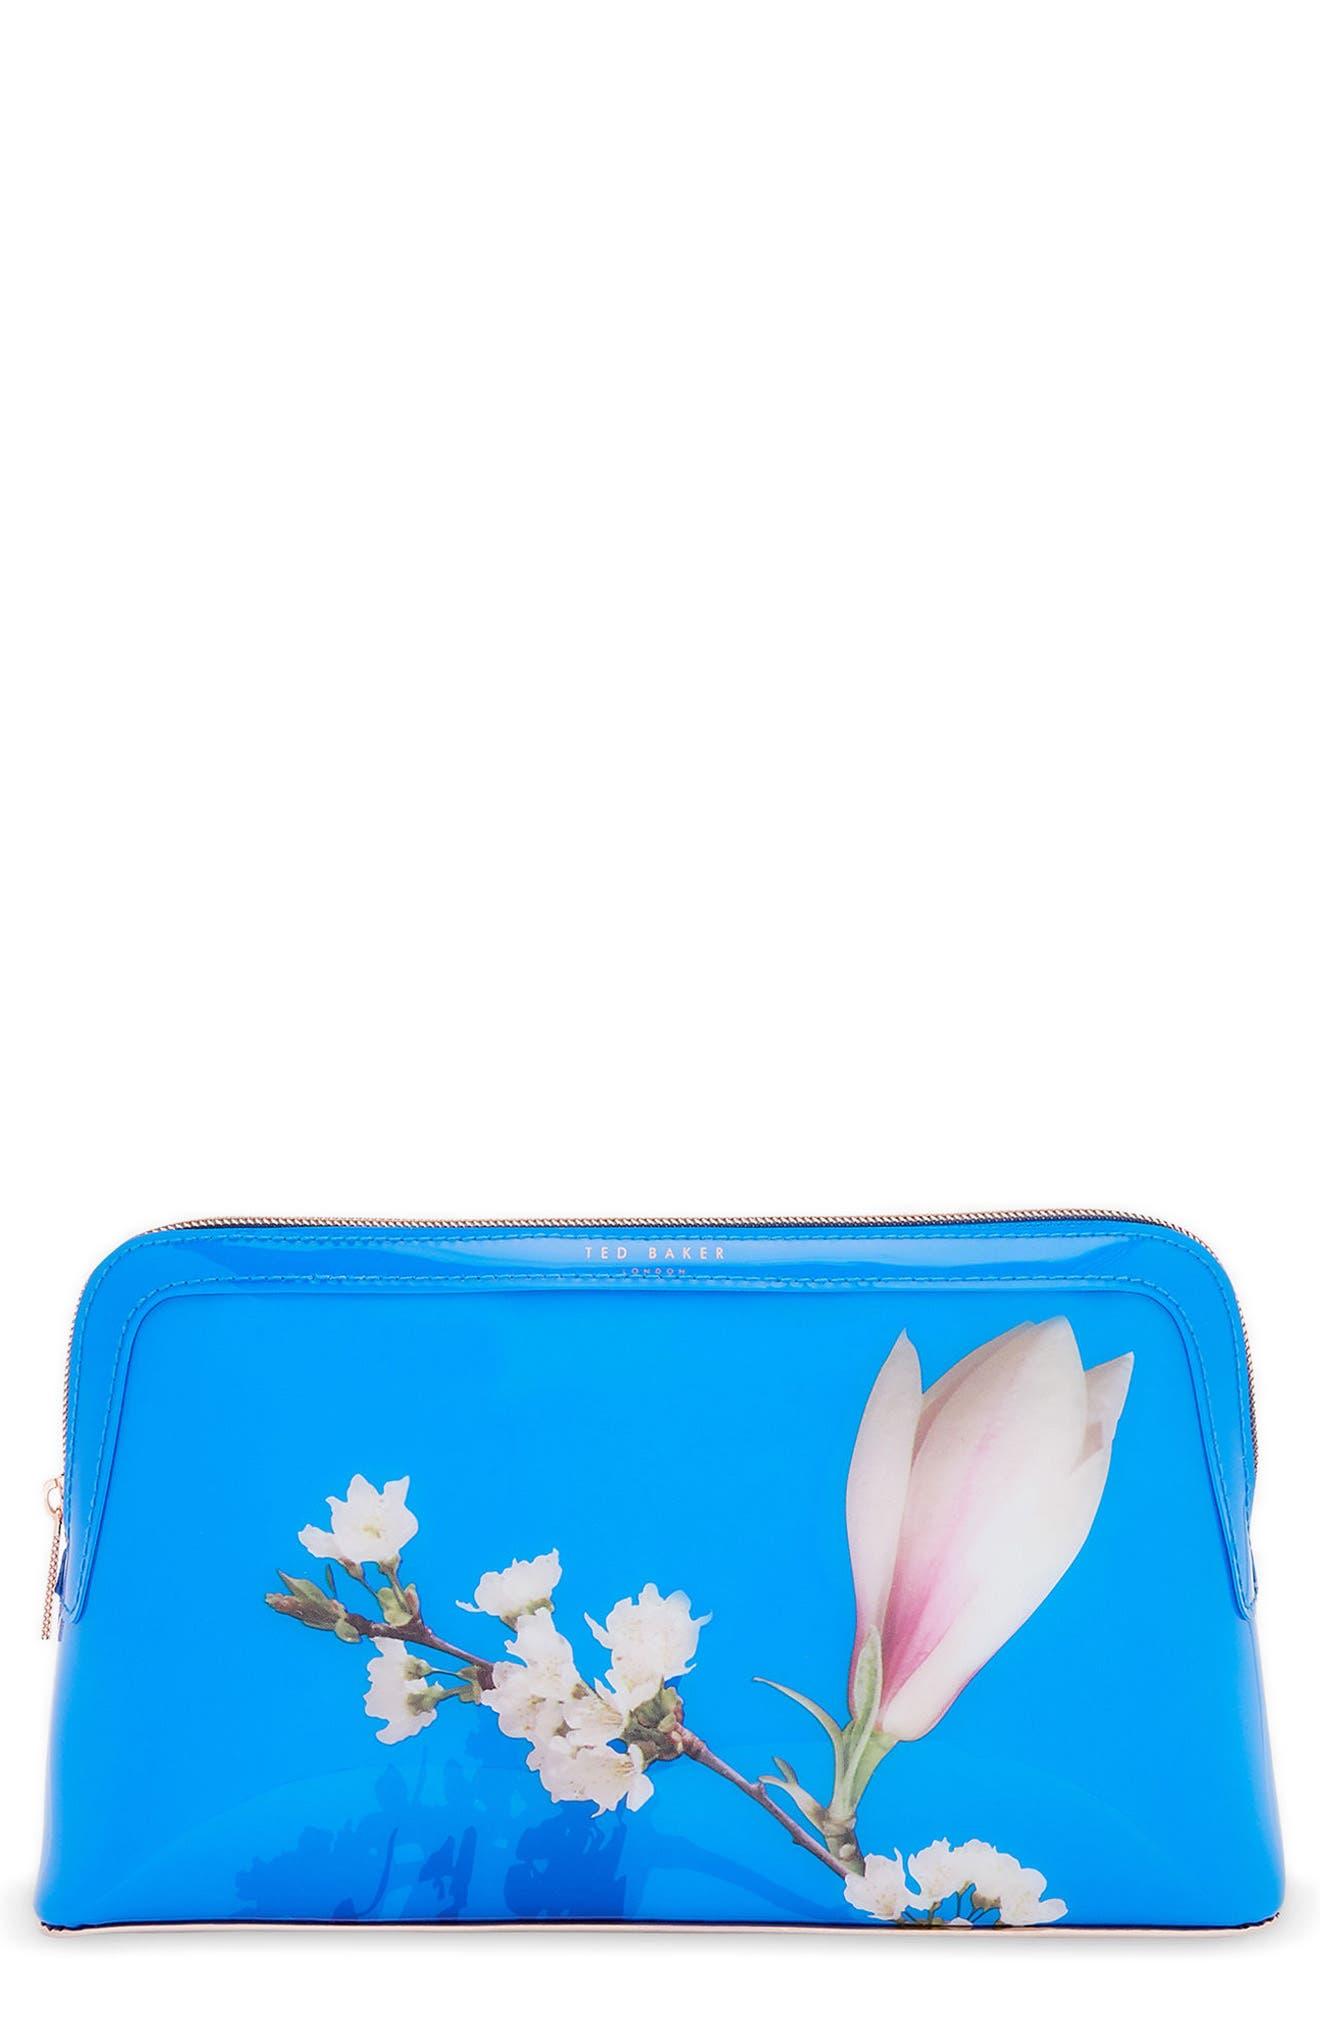 Daisyy – Harmony Wash Bag,                             Main thumbnail 1, color,                             Bright Blue